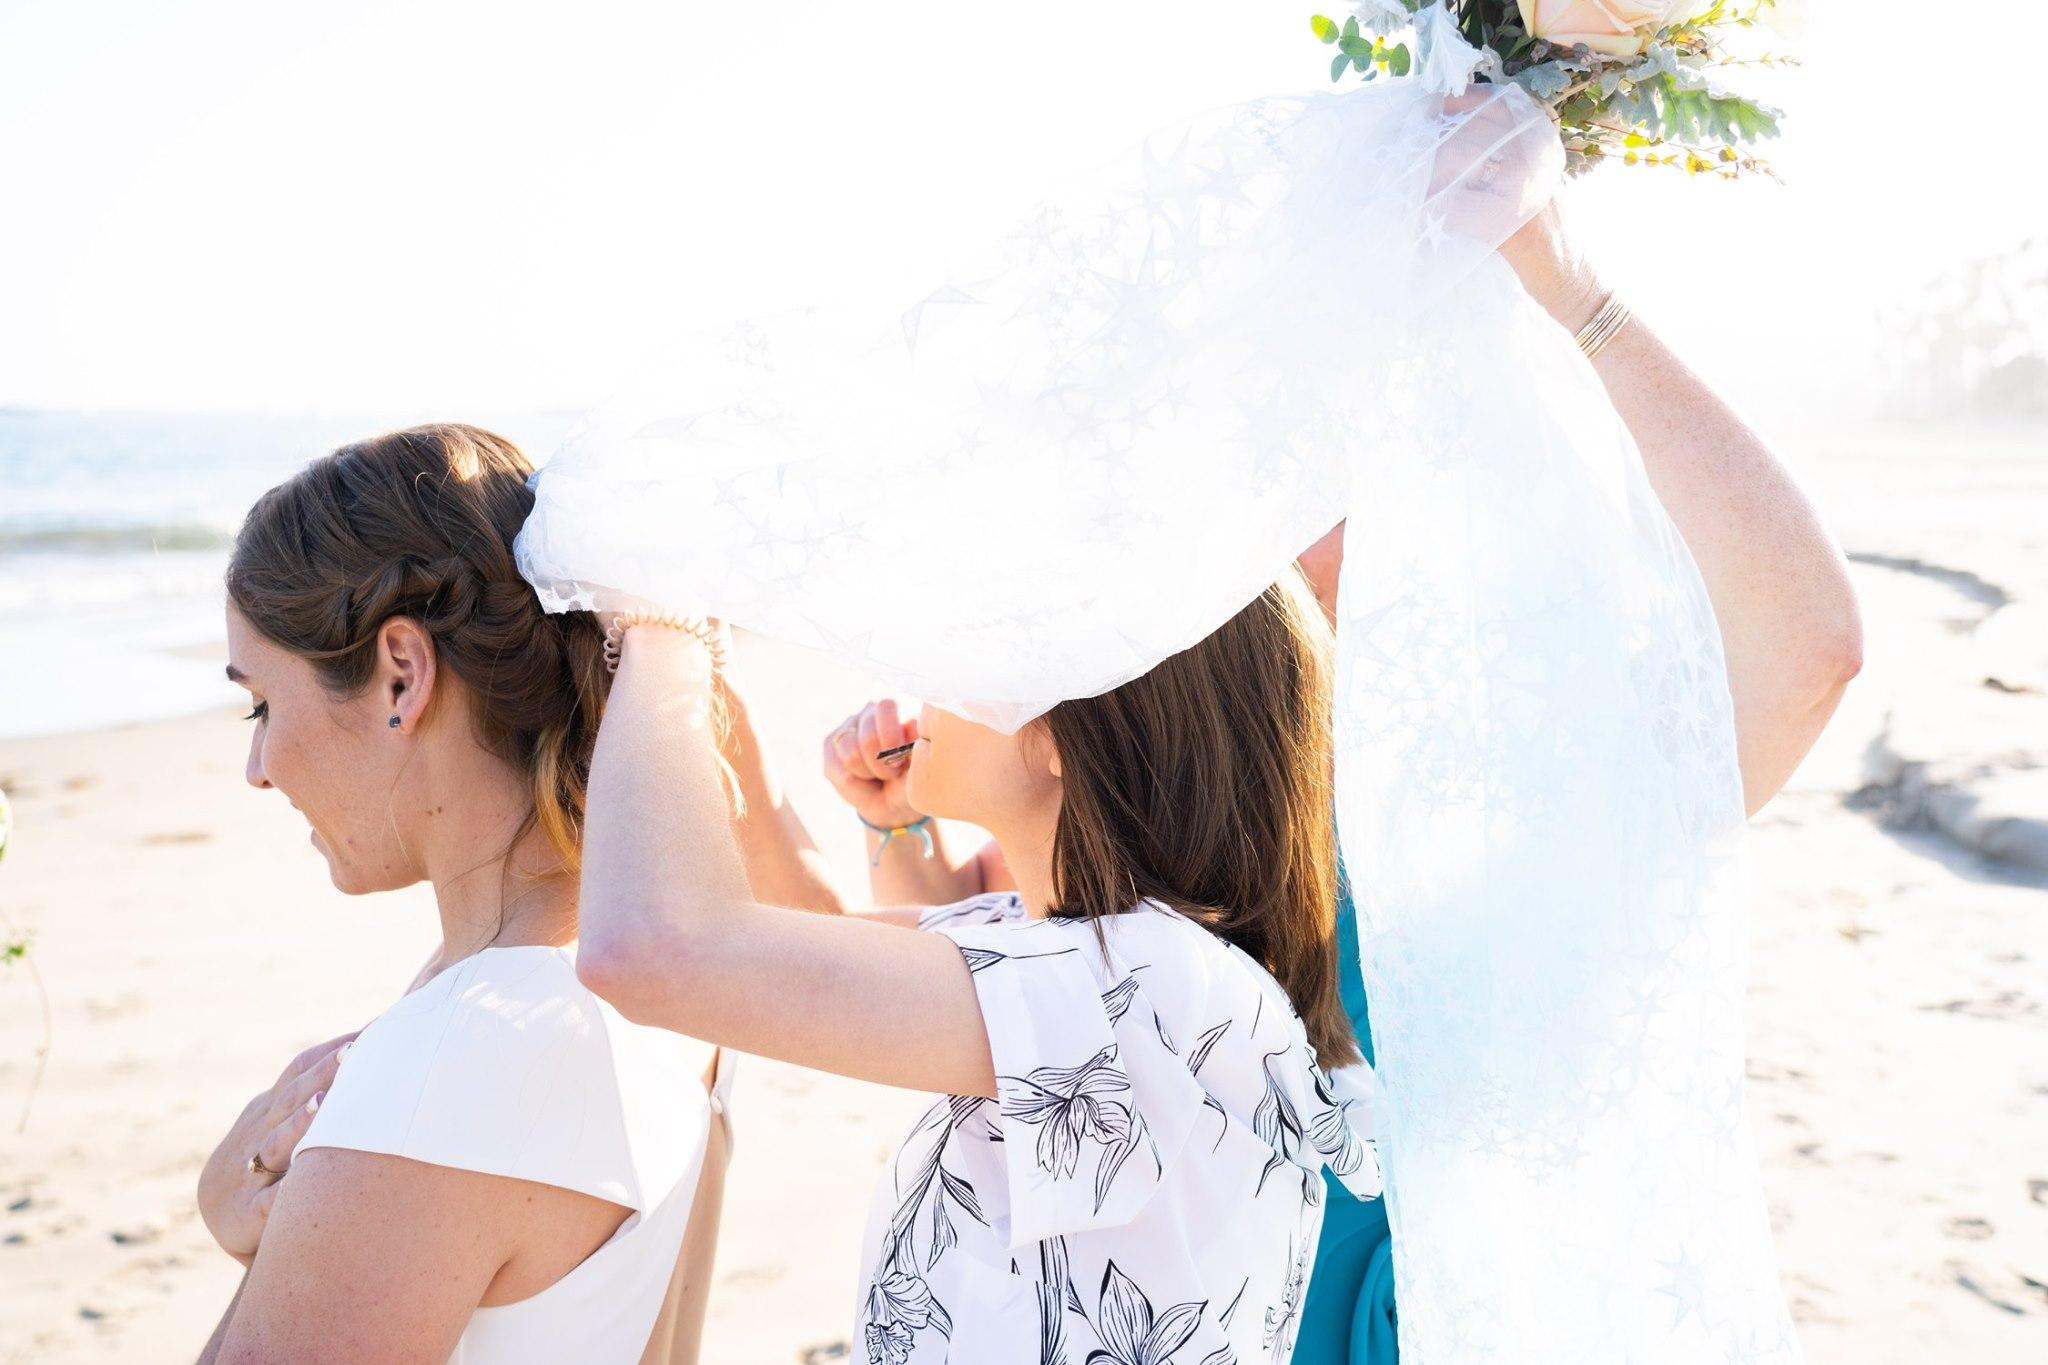 Wedding planner helping bride with veil